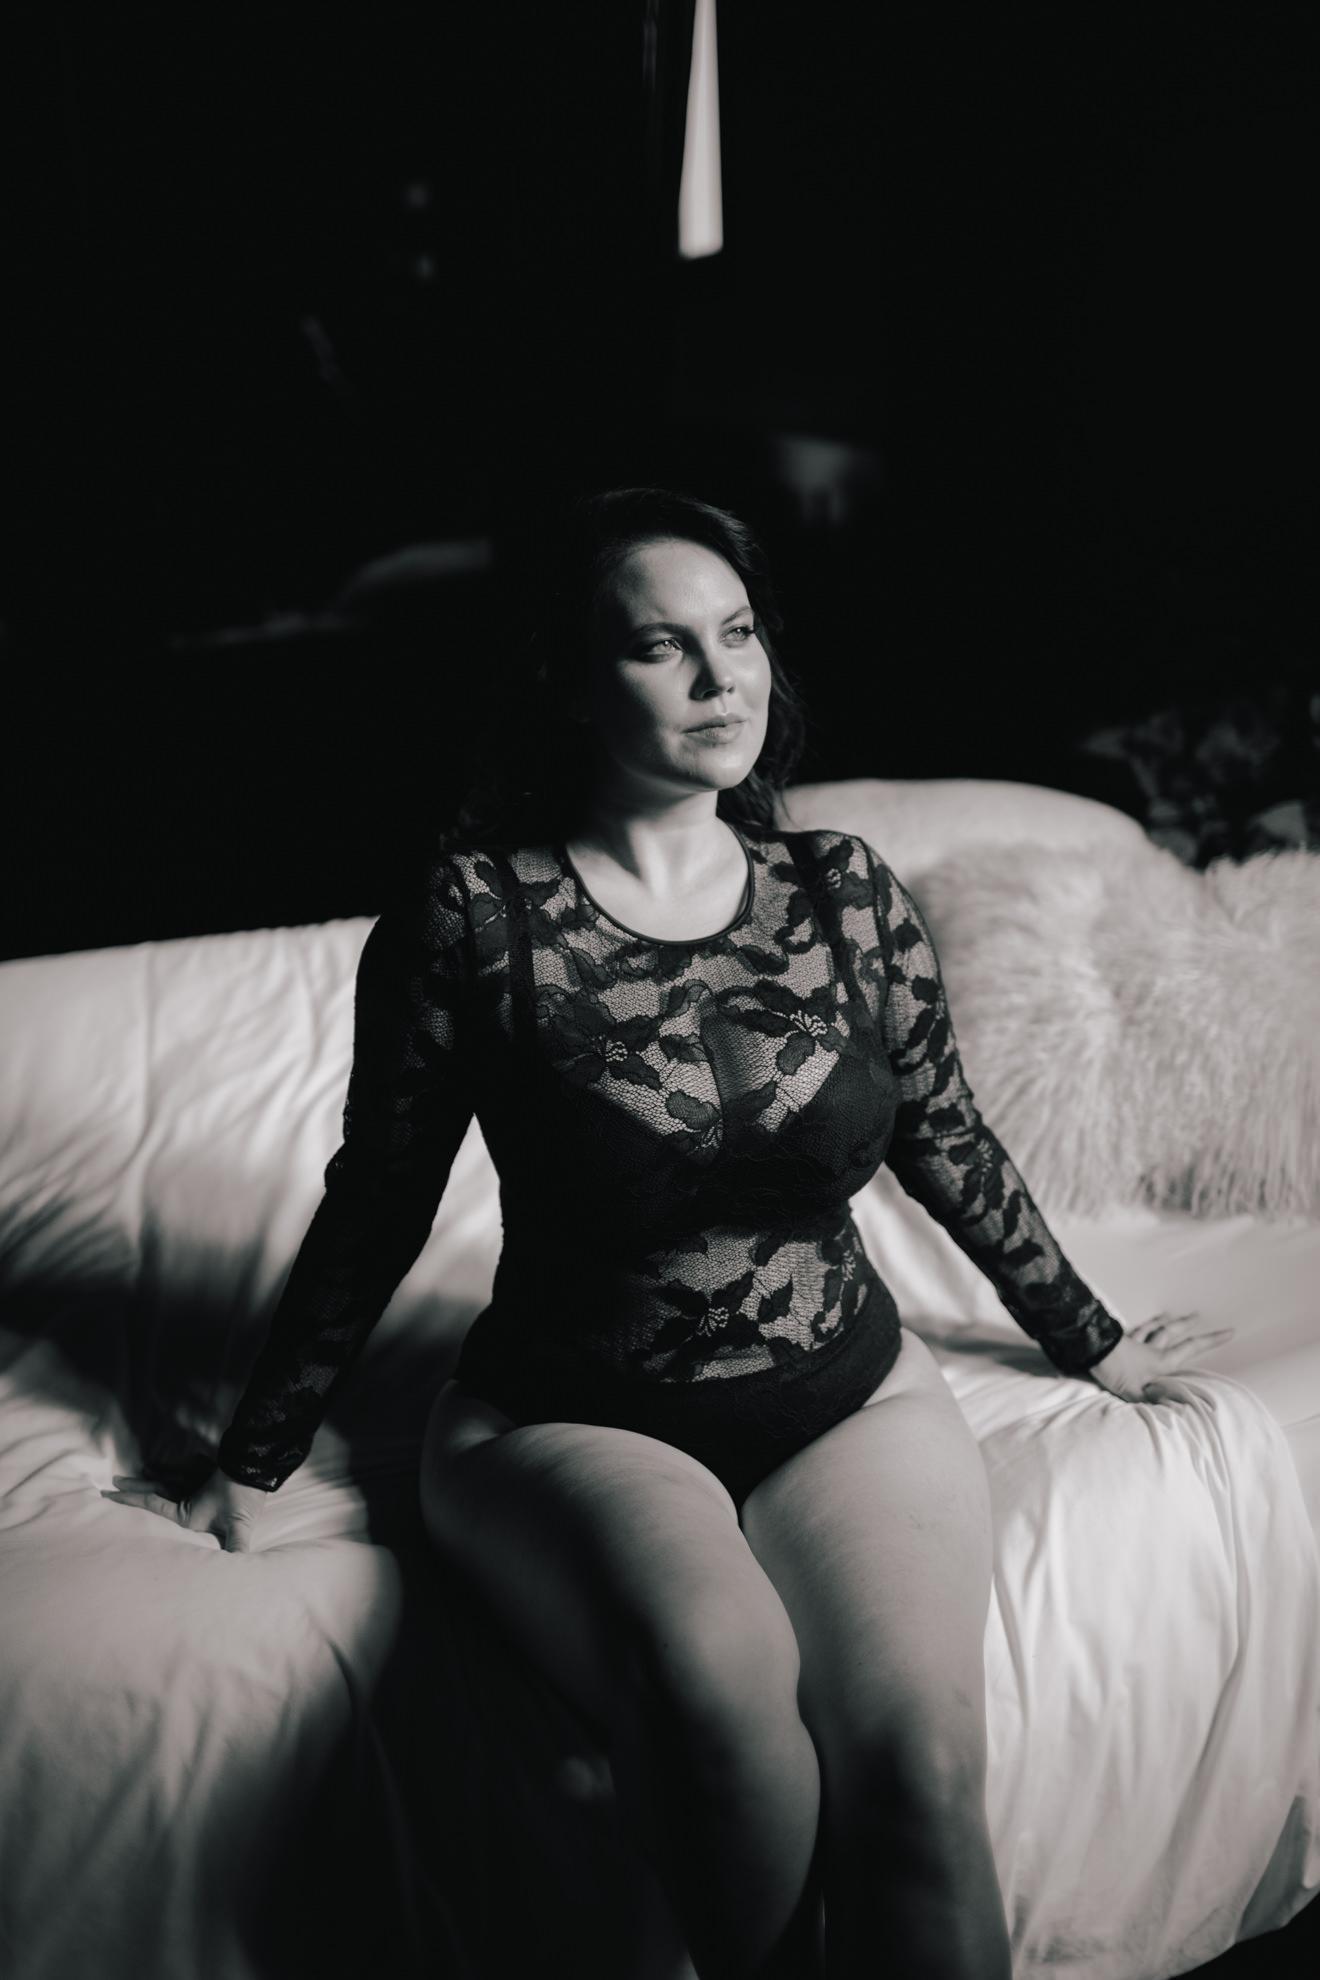 charleston sc boudoir photographer